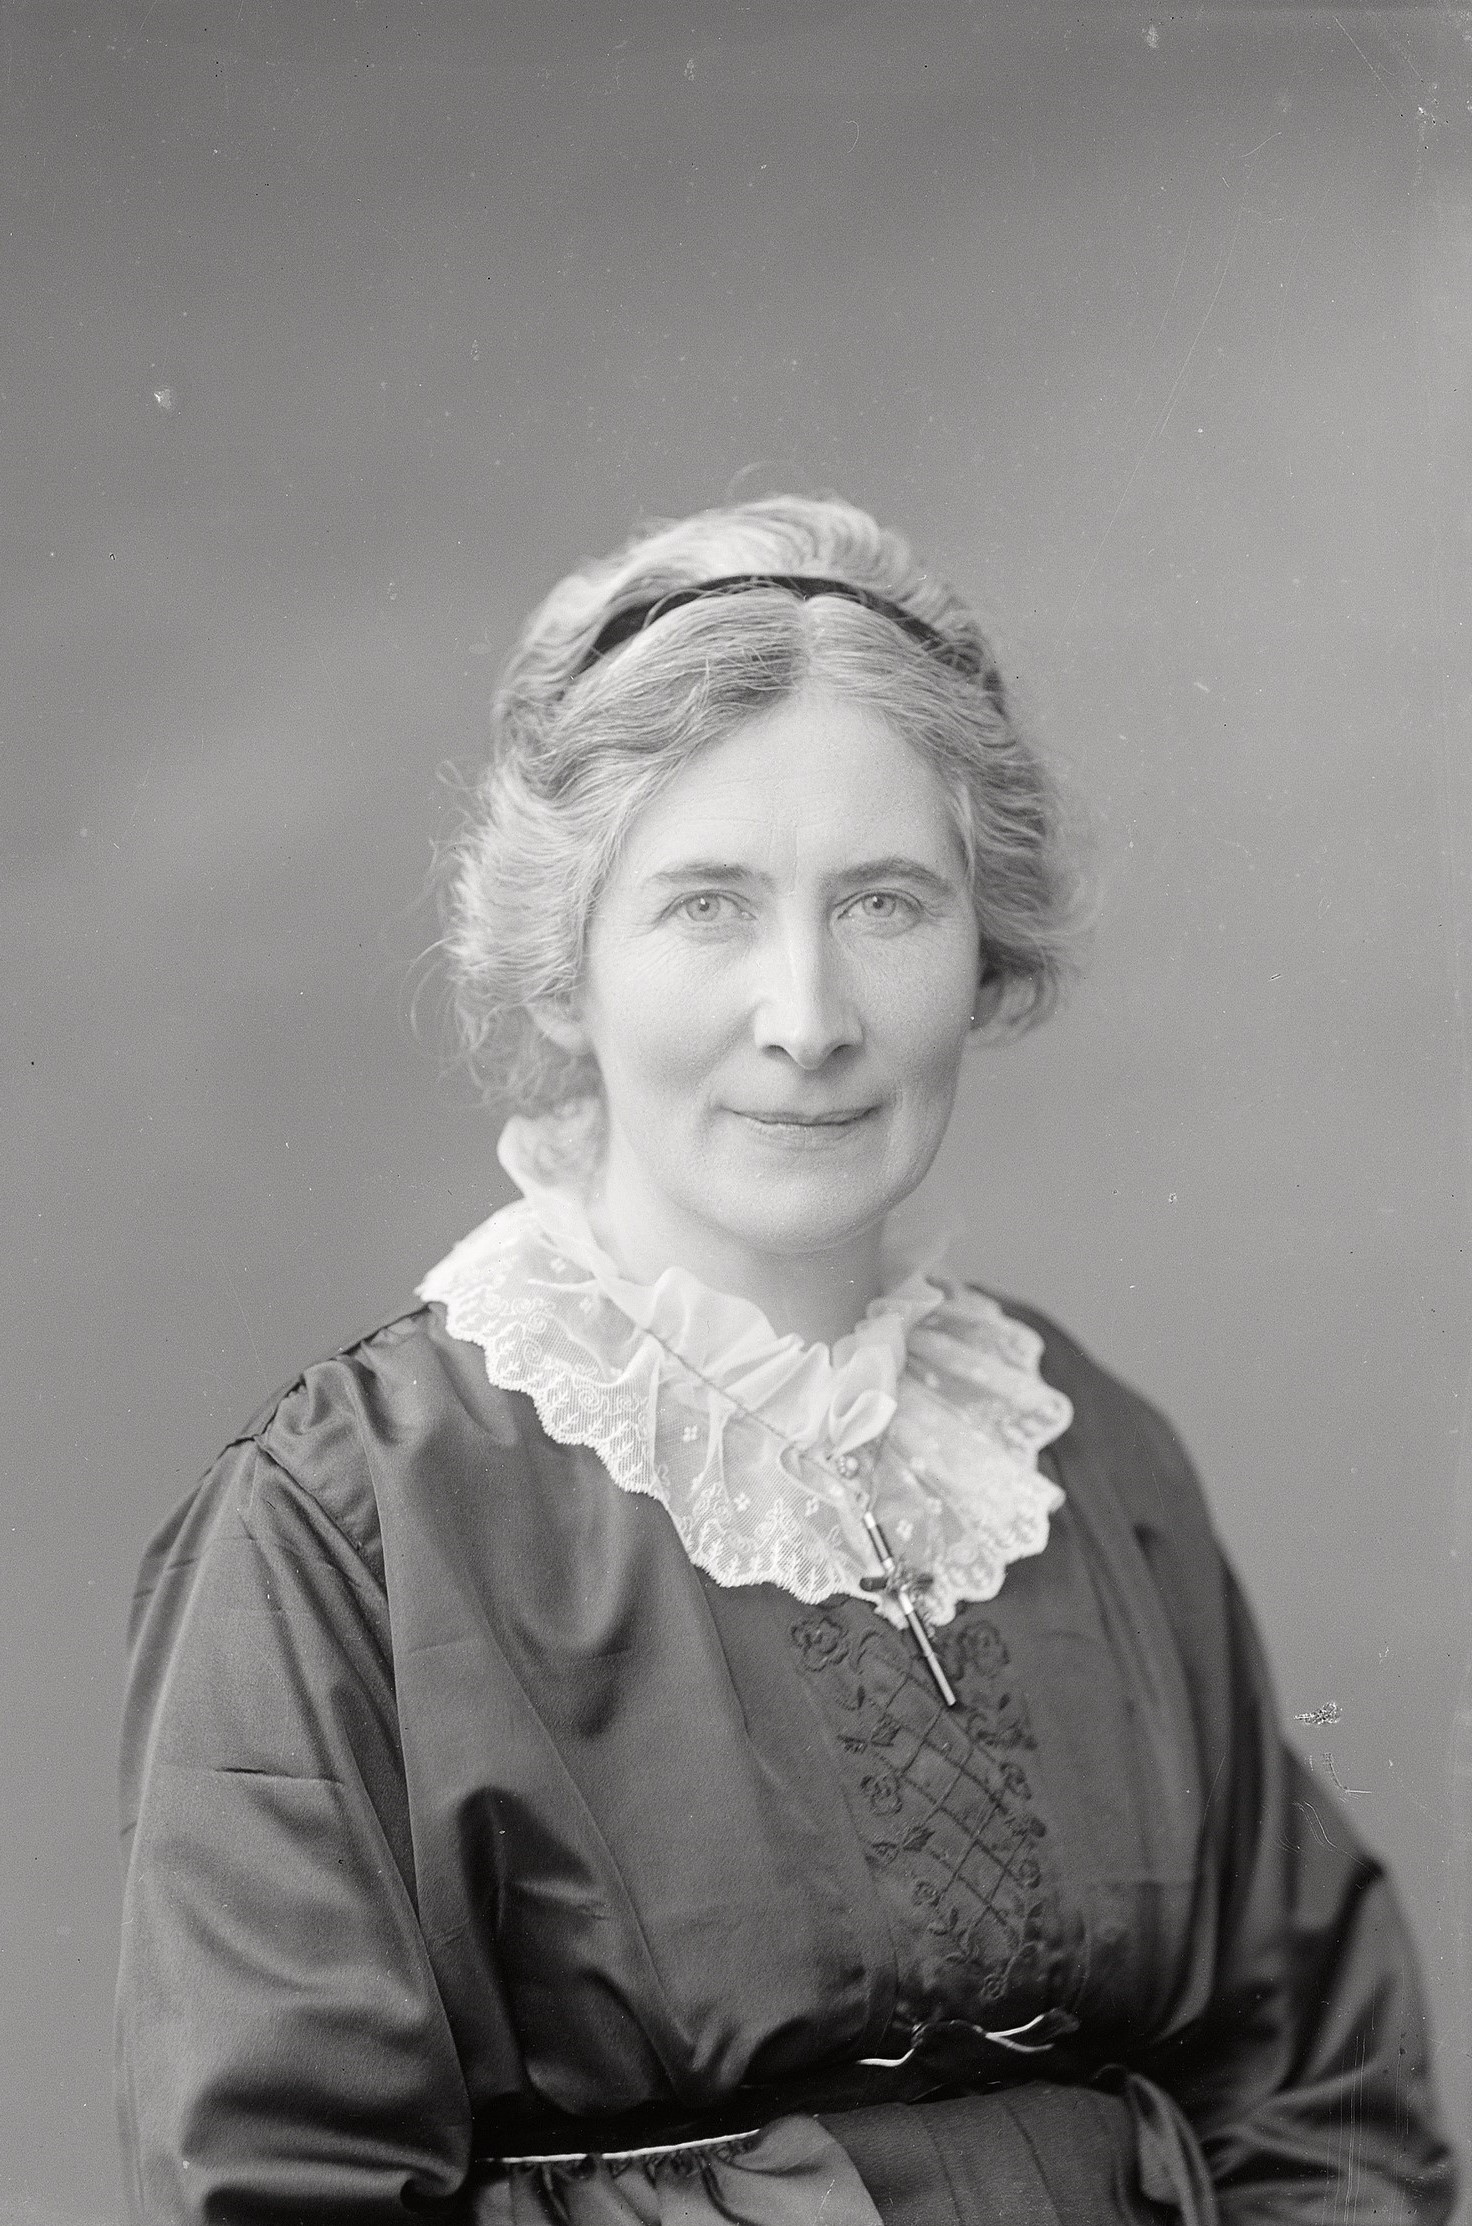 Elisabeth De Vylder, 1918. Photo: Per Bagge (1866-1936). Lund University Libraries, ublu-11534